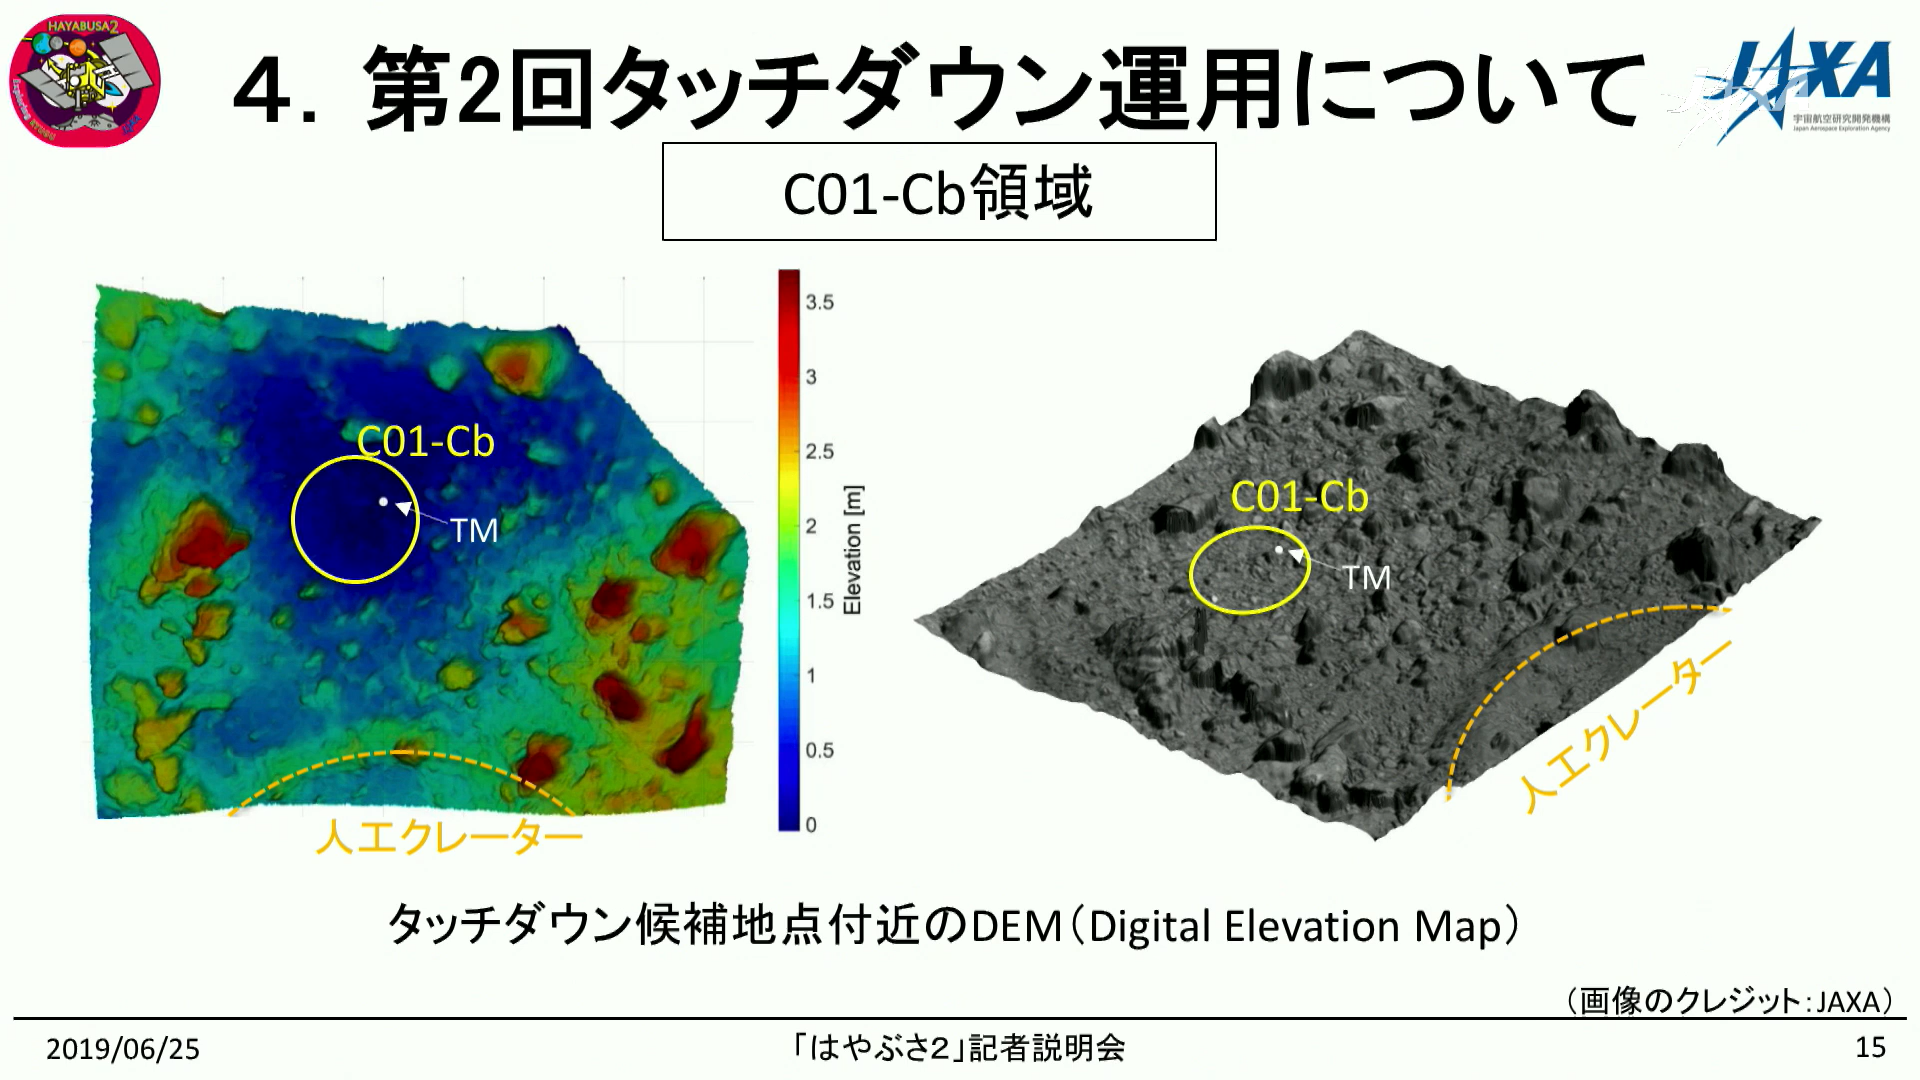 f:id:Imamura:20190625234801p:plain